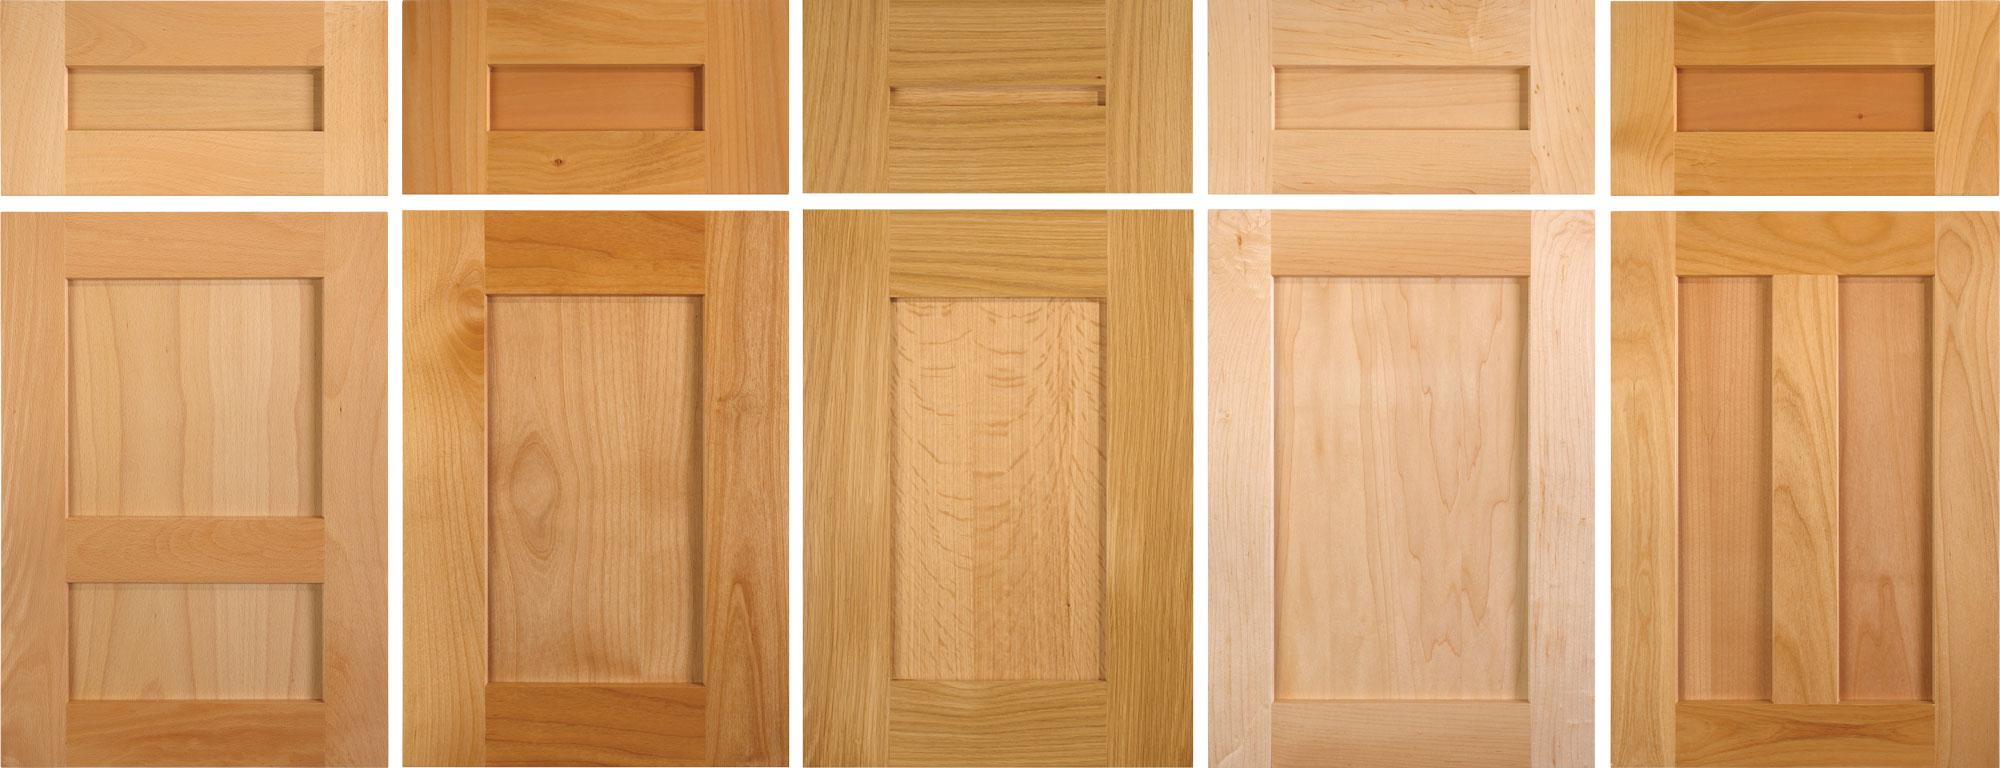 Shaker Cabinet Doors By TaylorCraft Cabinet Door Company